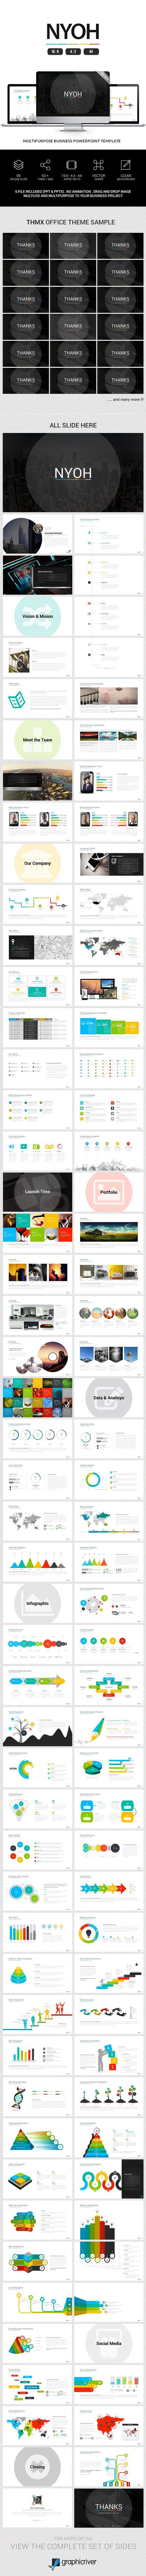 Nyoh Business Powerpoint Template - 99 Unique Slides